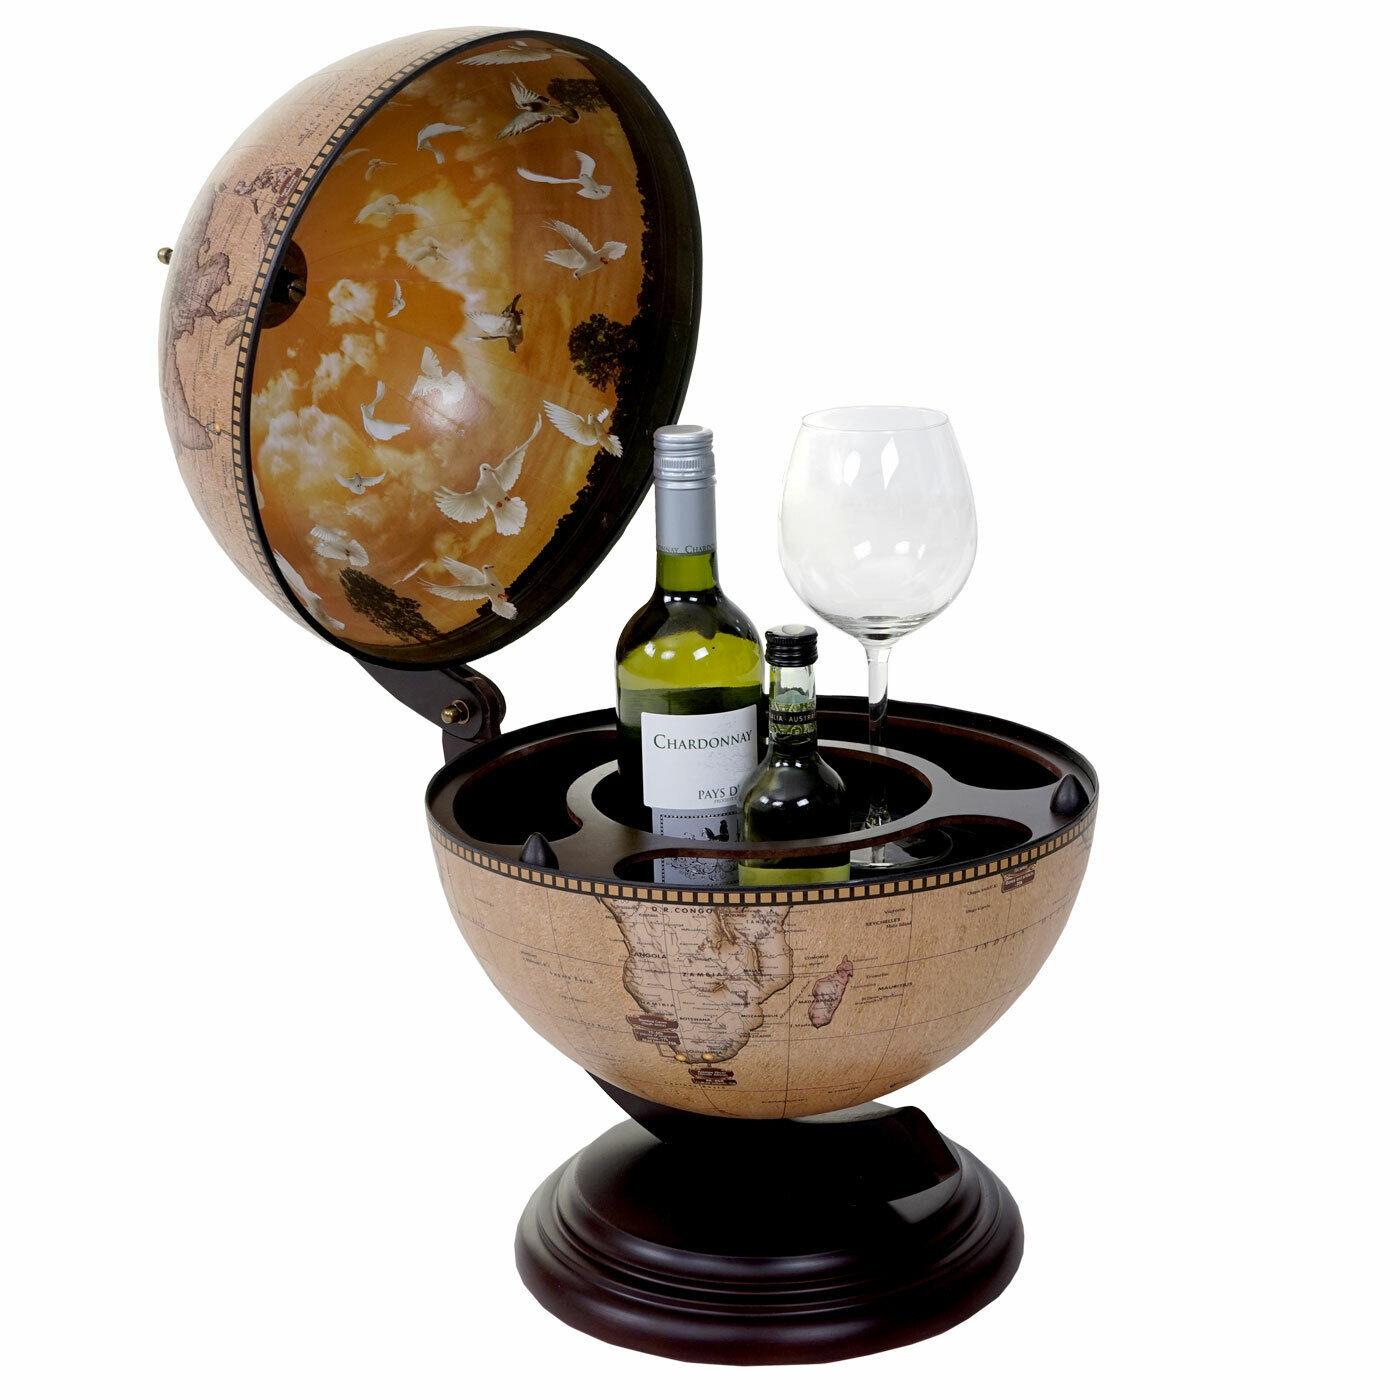 GLOBO tischbar mdc-t873, mini bar tischbar, globo terrestre per 3 bottiglie